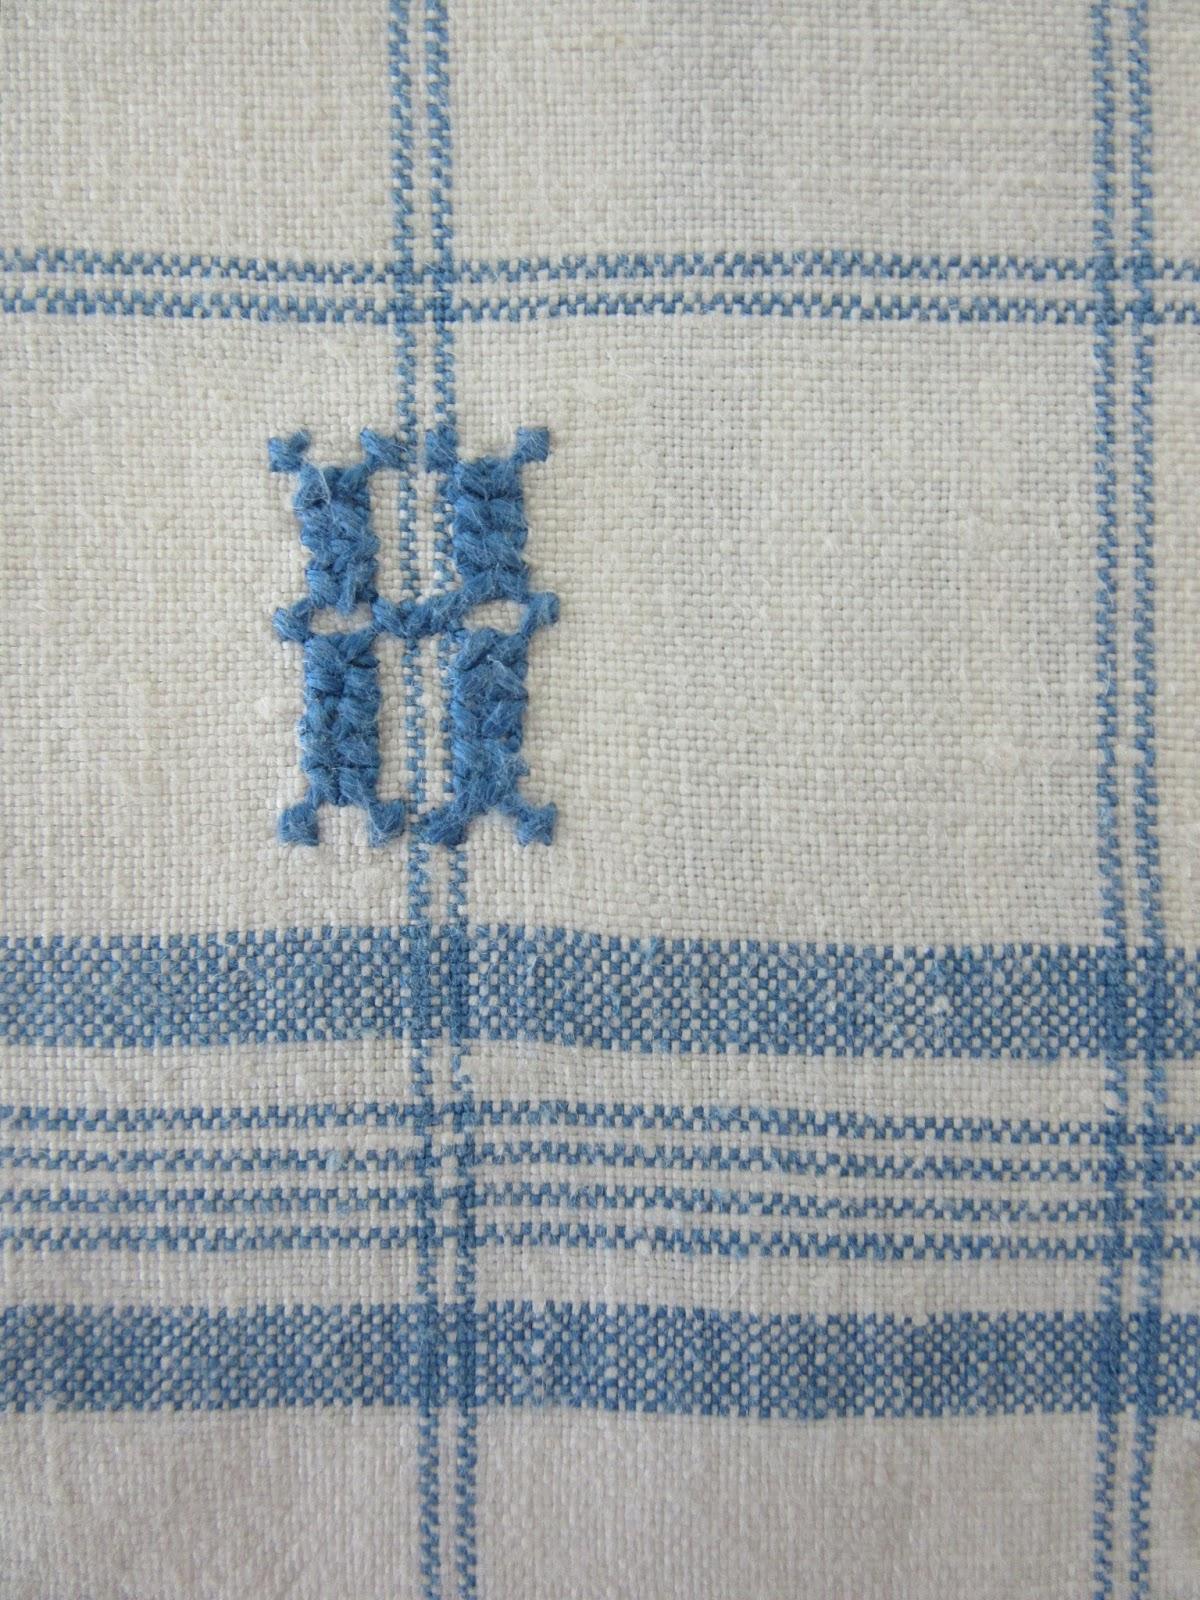 WYA CROSS STITCH PATTERN ONLY HM DAYS OF THE WEEK  STITCHING TOWELS